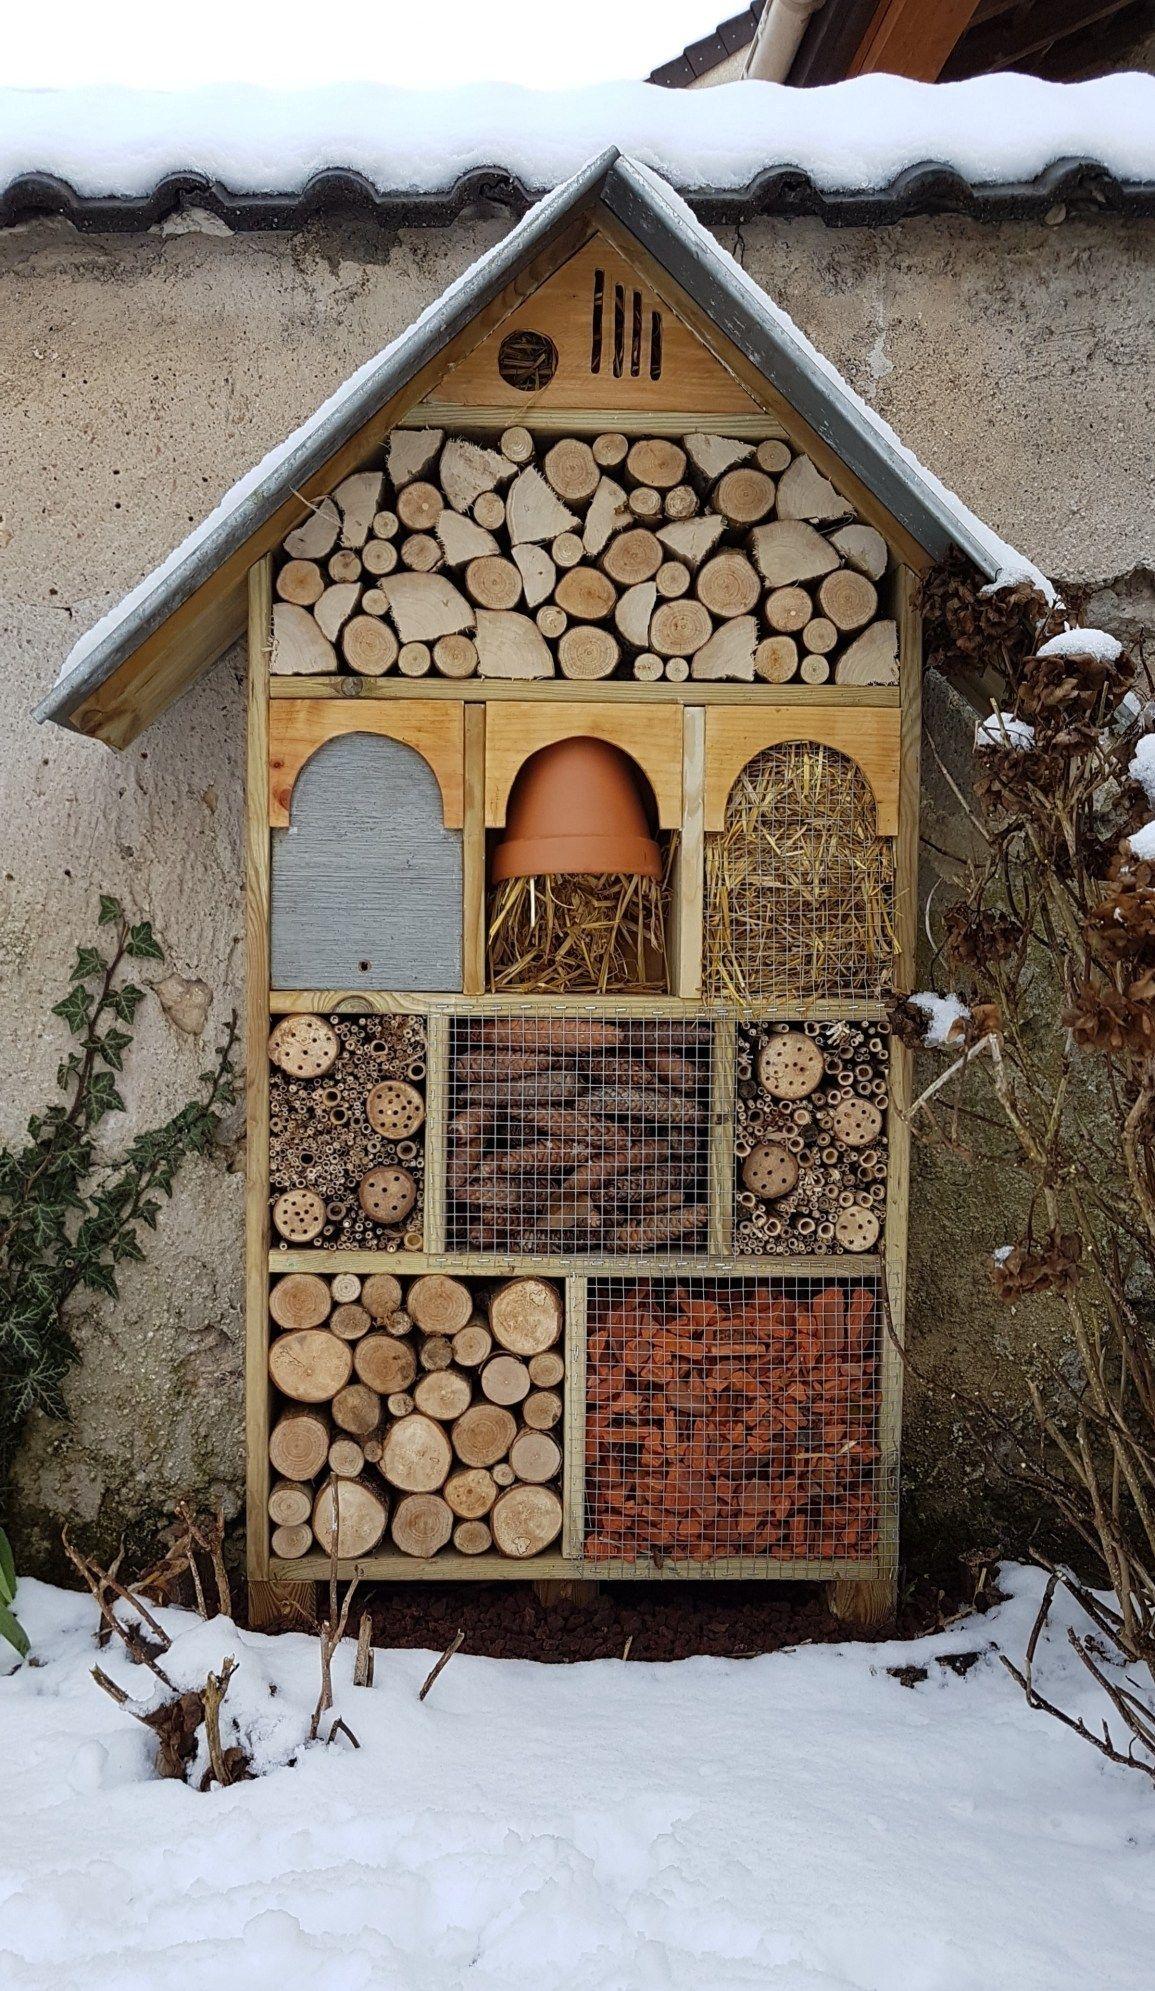 So baut man ein Insektenhotel - Die Manowerker #towers